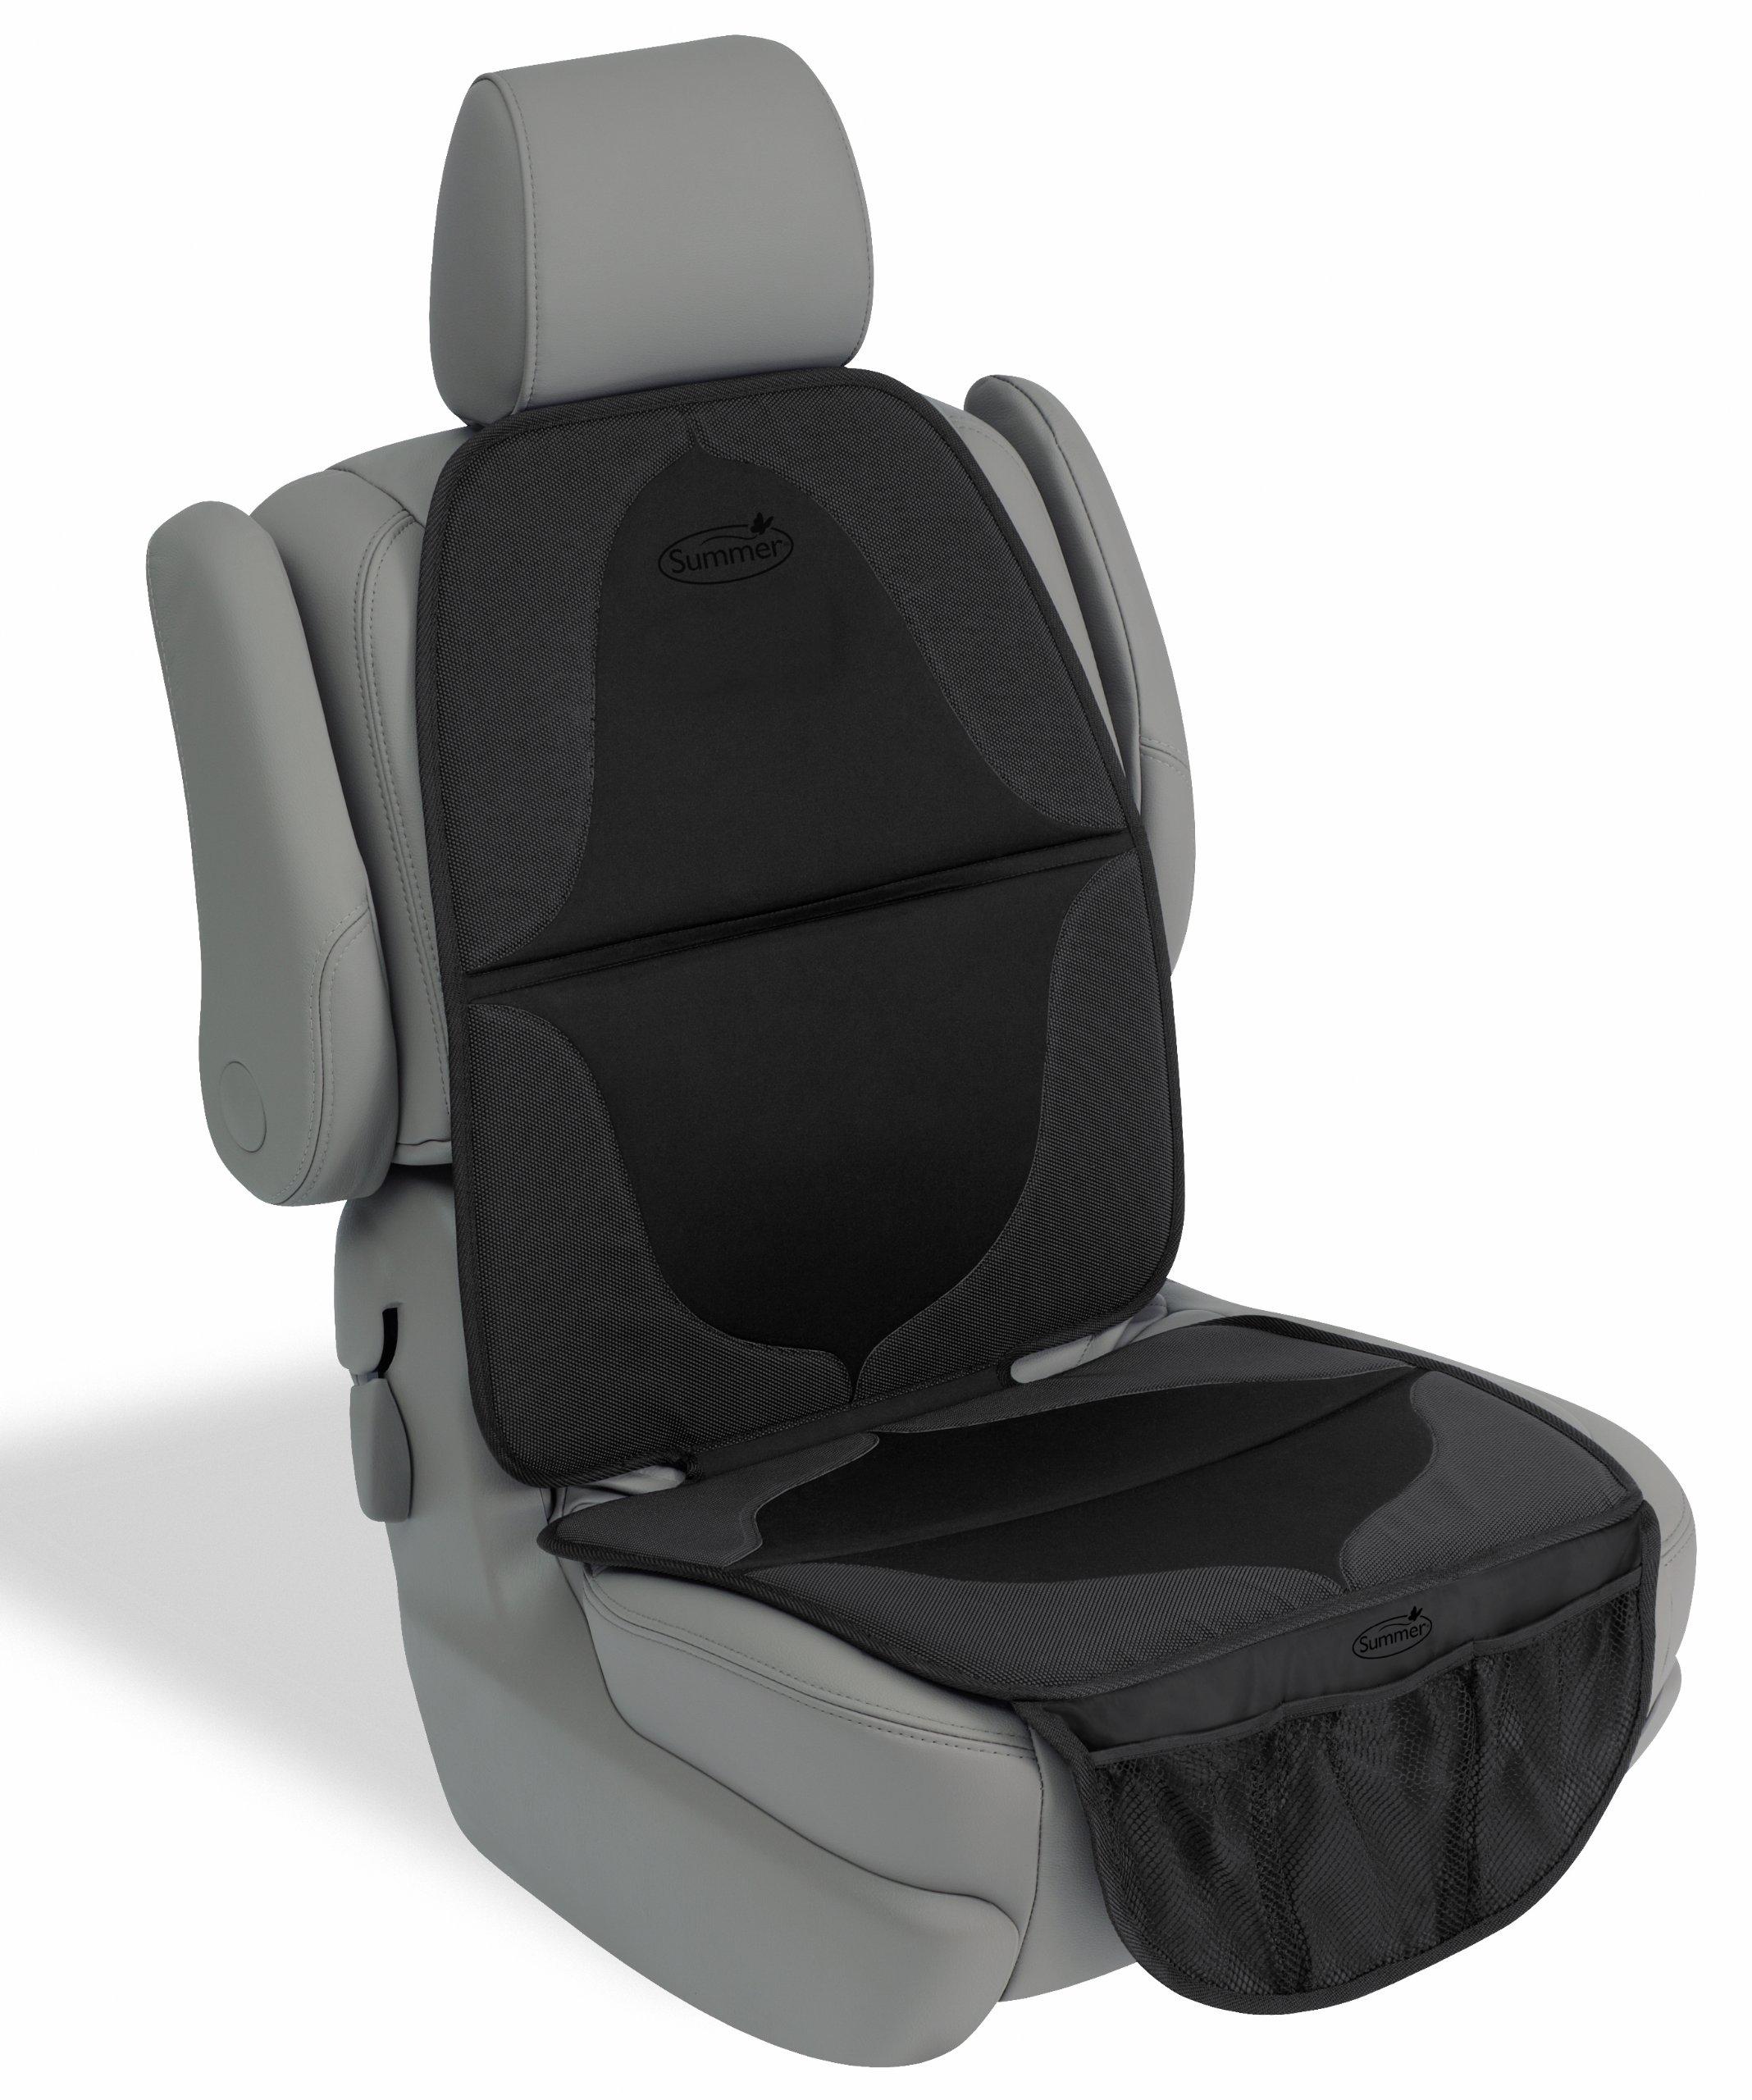 Summer Infant Elite DuoMat for Car Seat, Black by Summer Infant (Image #1)